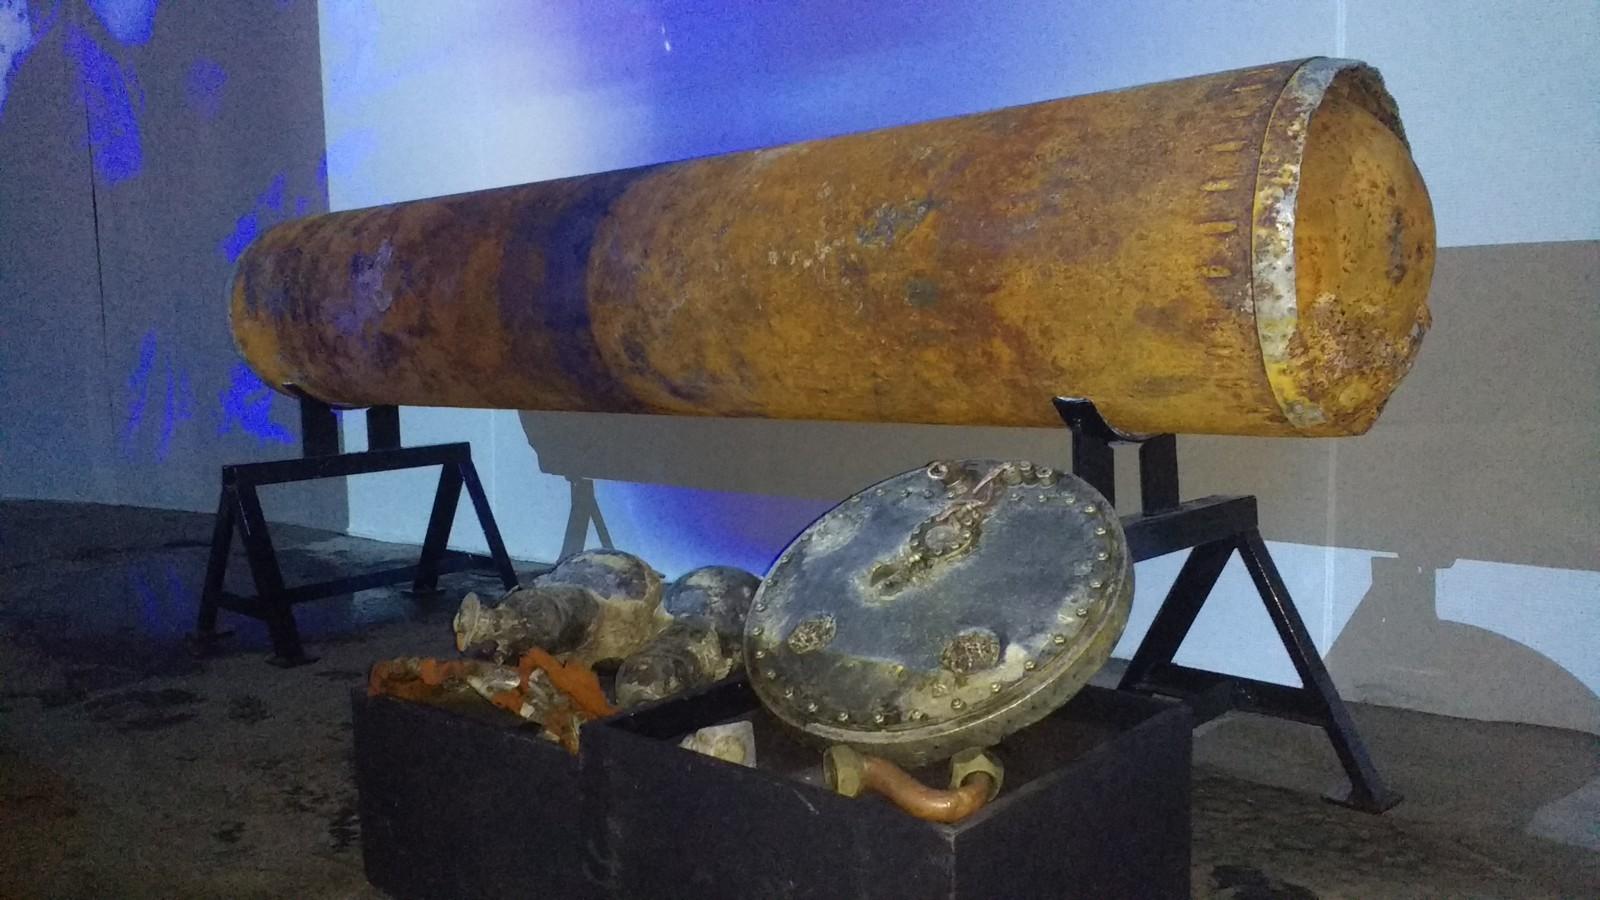 Torpedo pronađen pred Opatijom dopremljen na izložbu